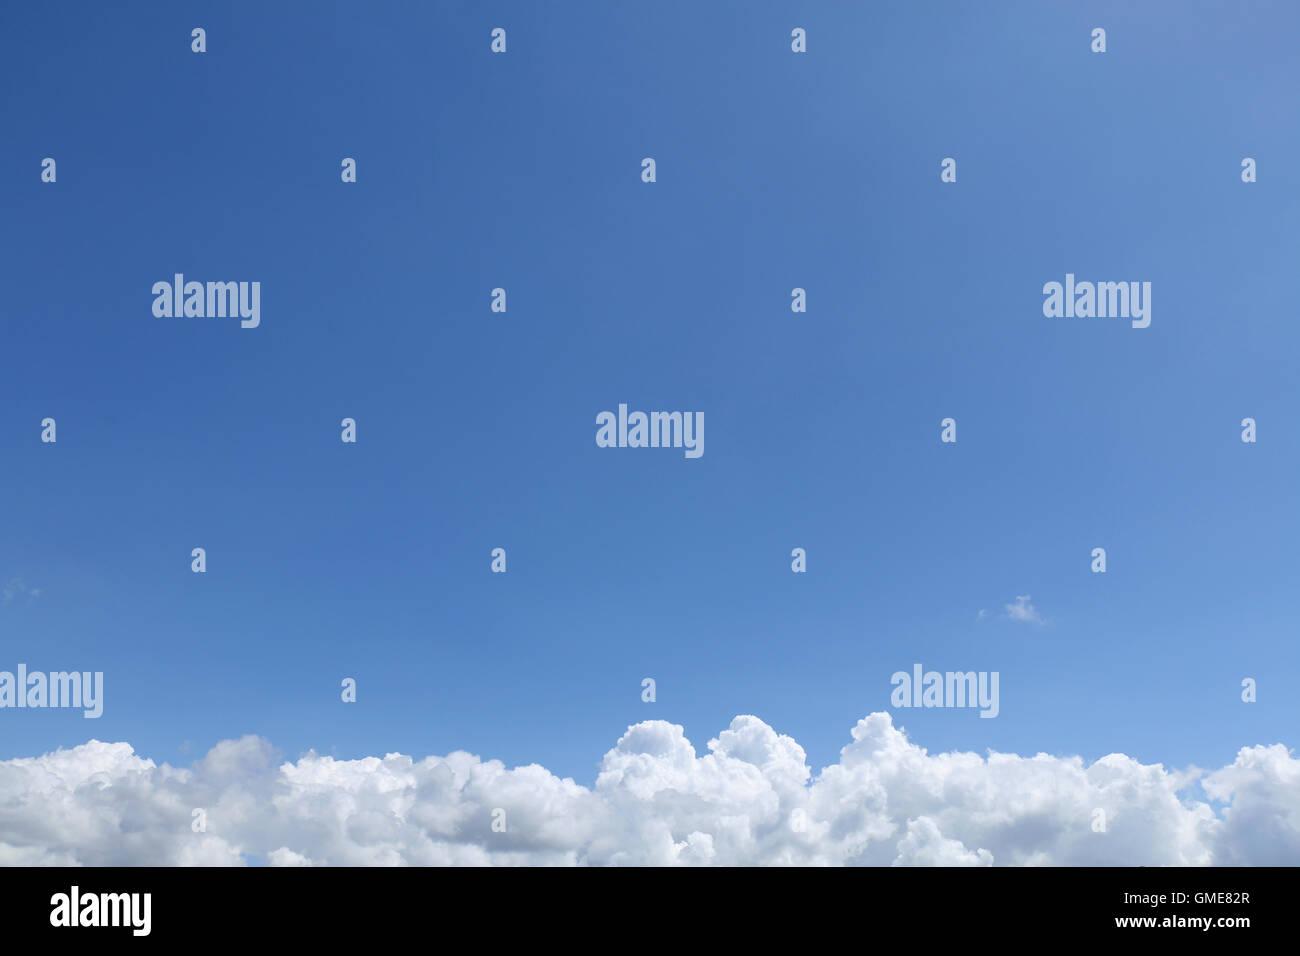 cumulonimbus cloud and blue sky background - Stock Image